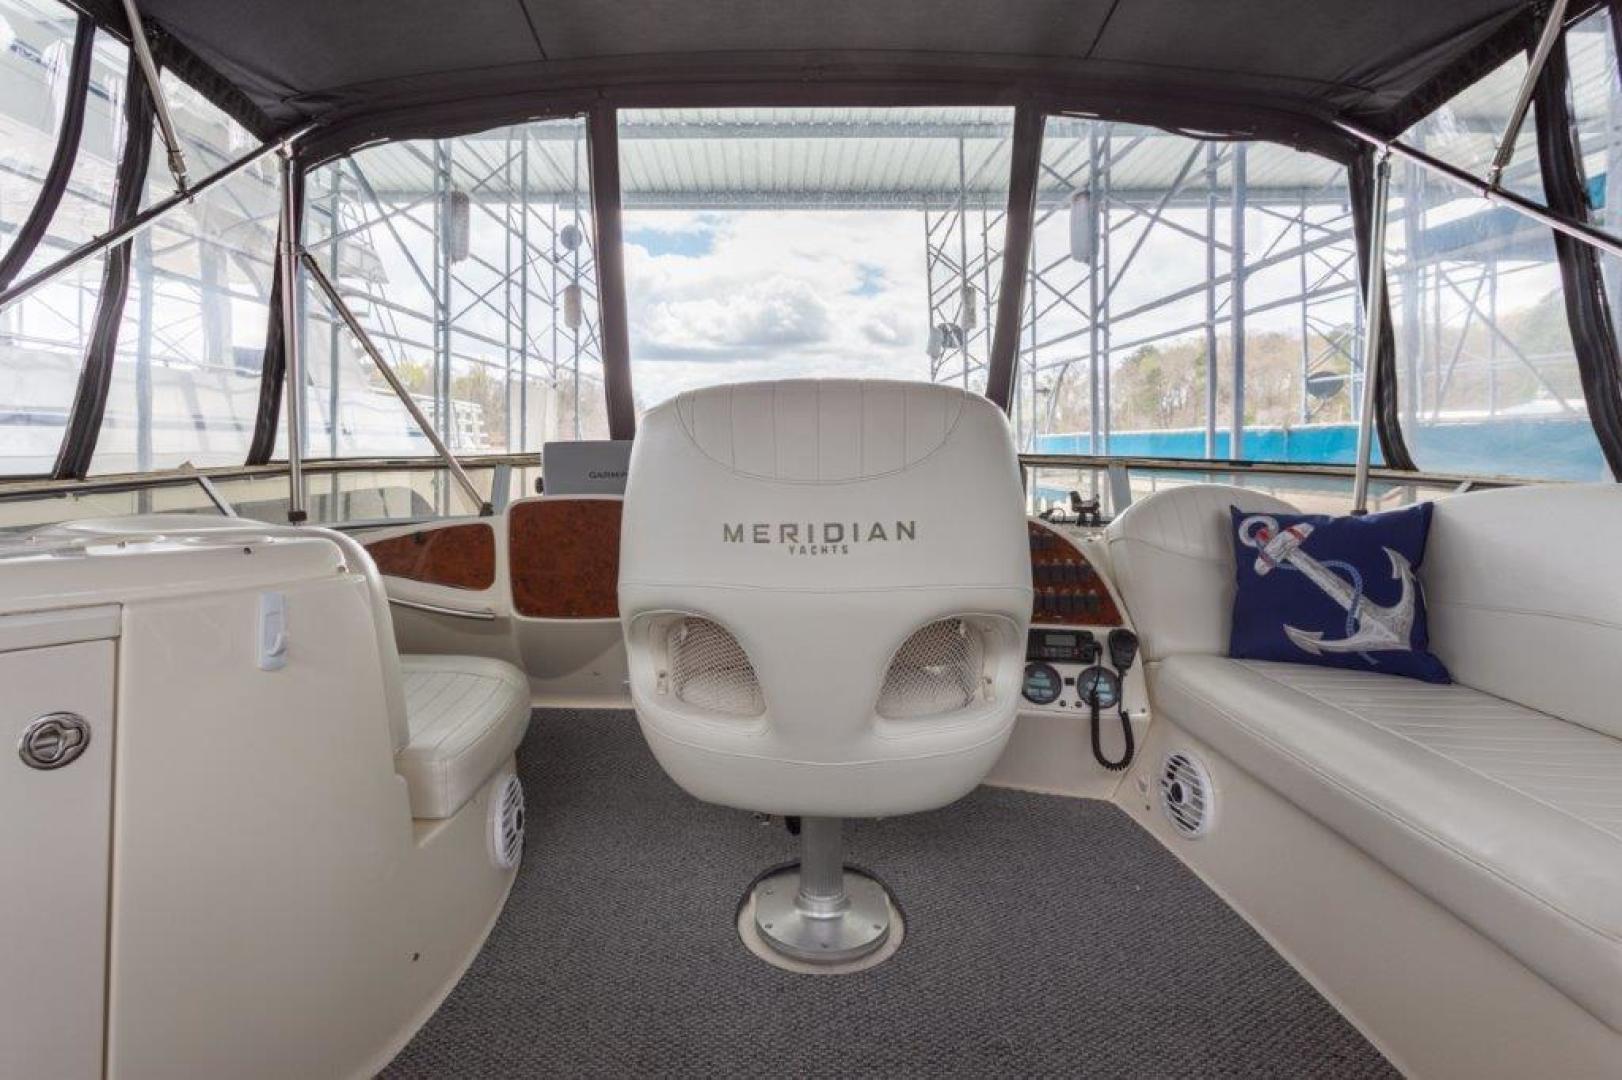 Meridian-459 Motoryacht 2004-Total Pleasure Chattanooga-Tennessee-United States-553074 | Thumbnail